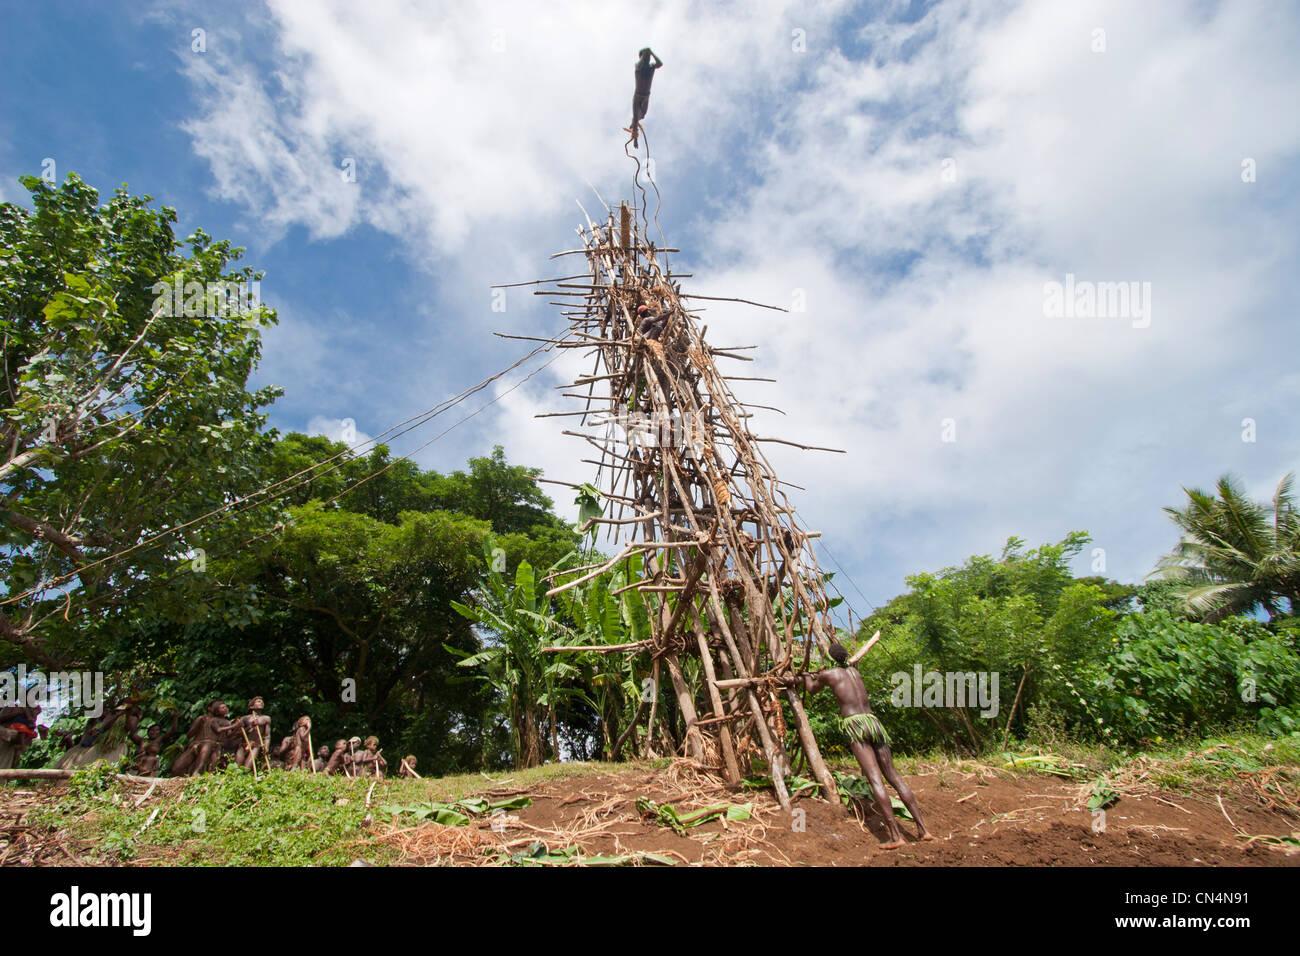 Vanuatu, Penama Province, Pentecost Island, Lonorore, Naghol, traditional land diving, rite of passage from childhood - Stock Image